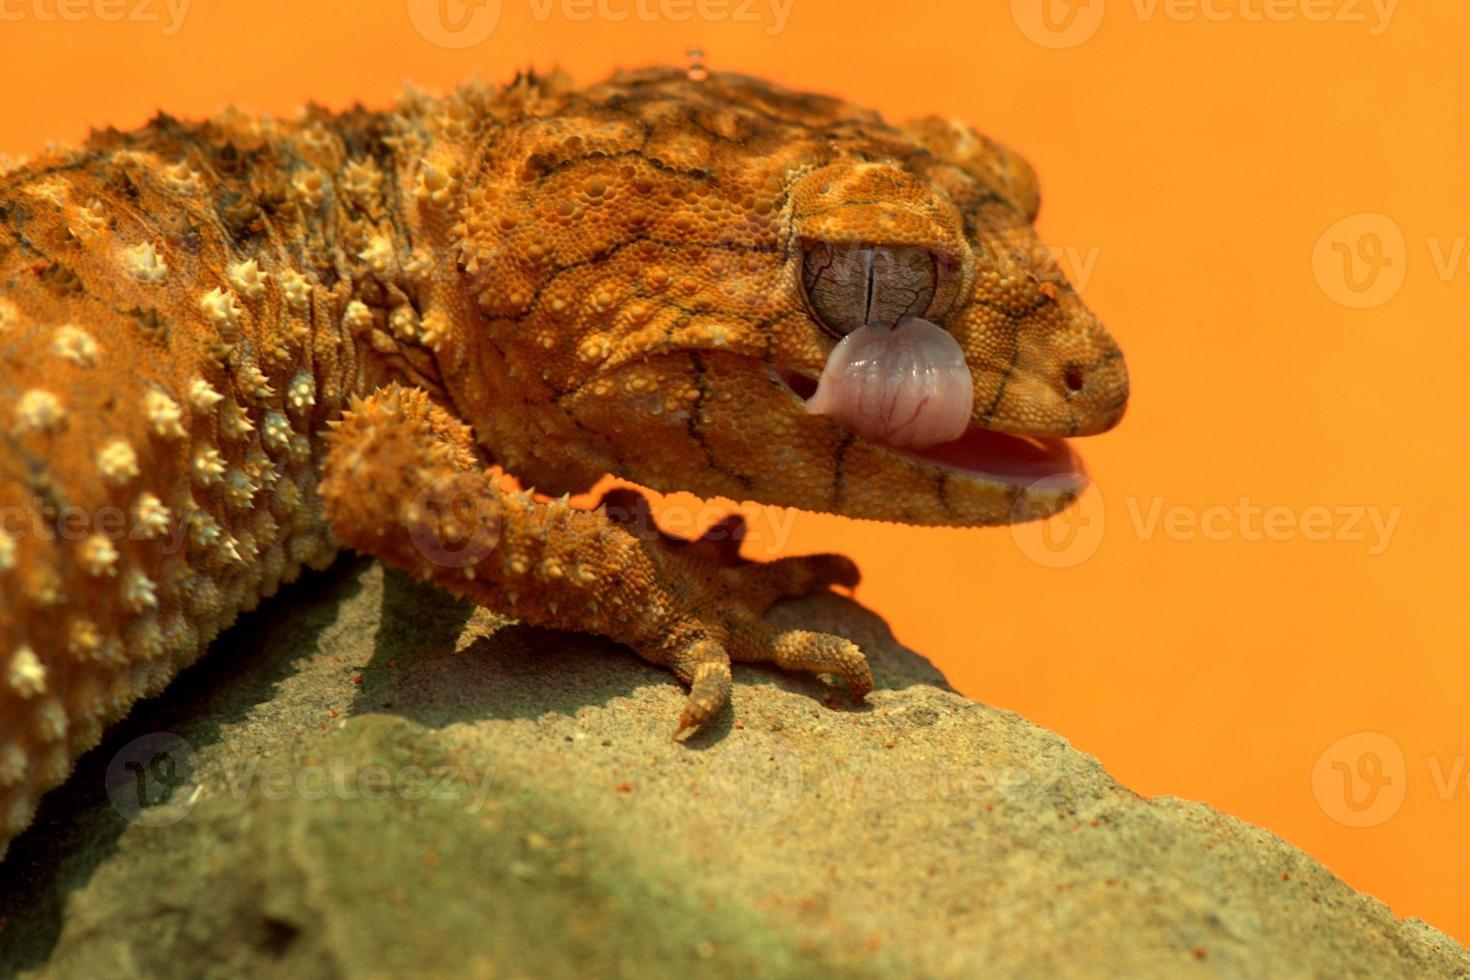 olho lickiing lagartixa foto